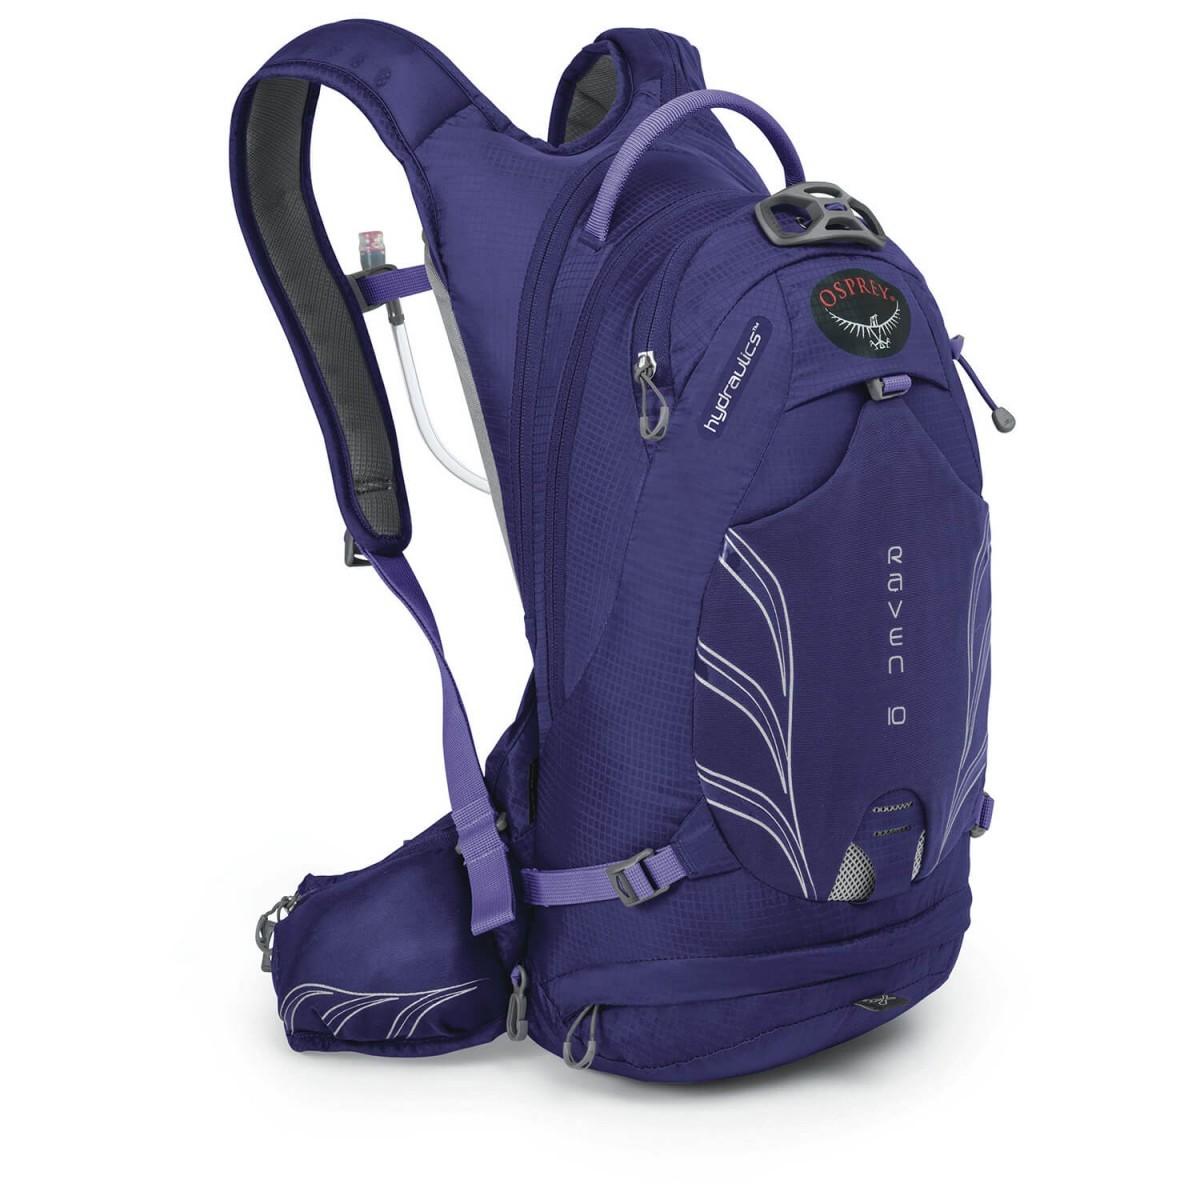 Raven 10 (Royal Purple)★リュック・バックパック・登山・山歩・トレッキング★ レディース Women's オスプレー